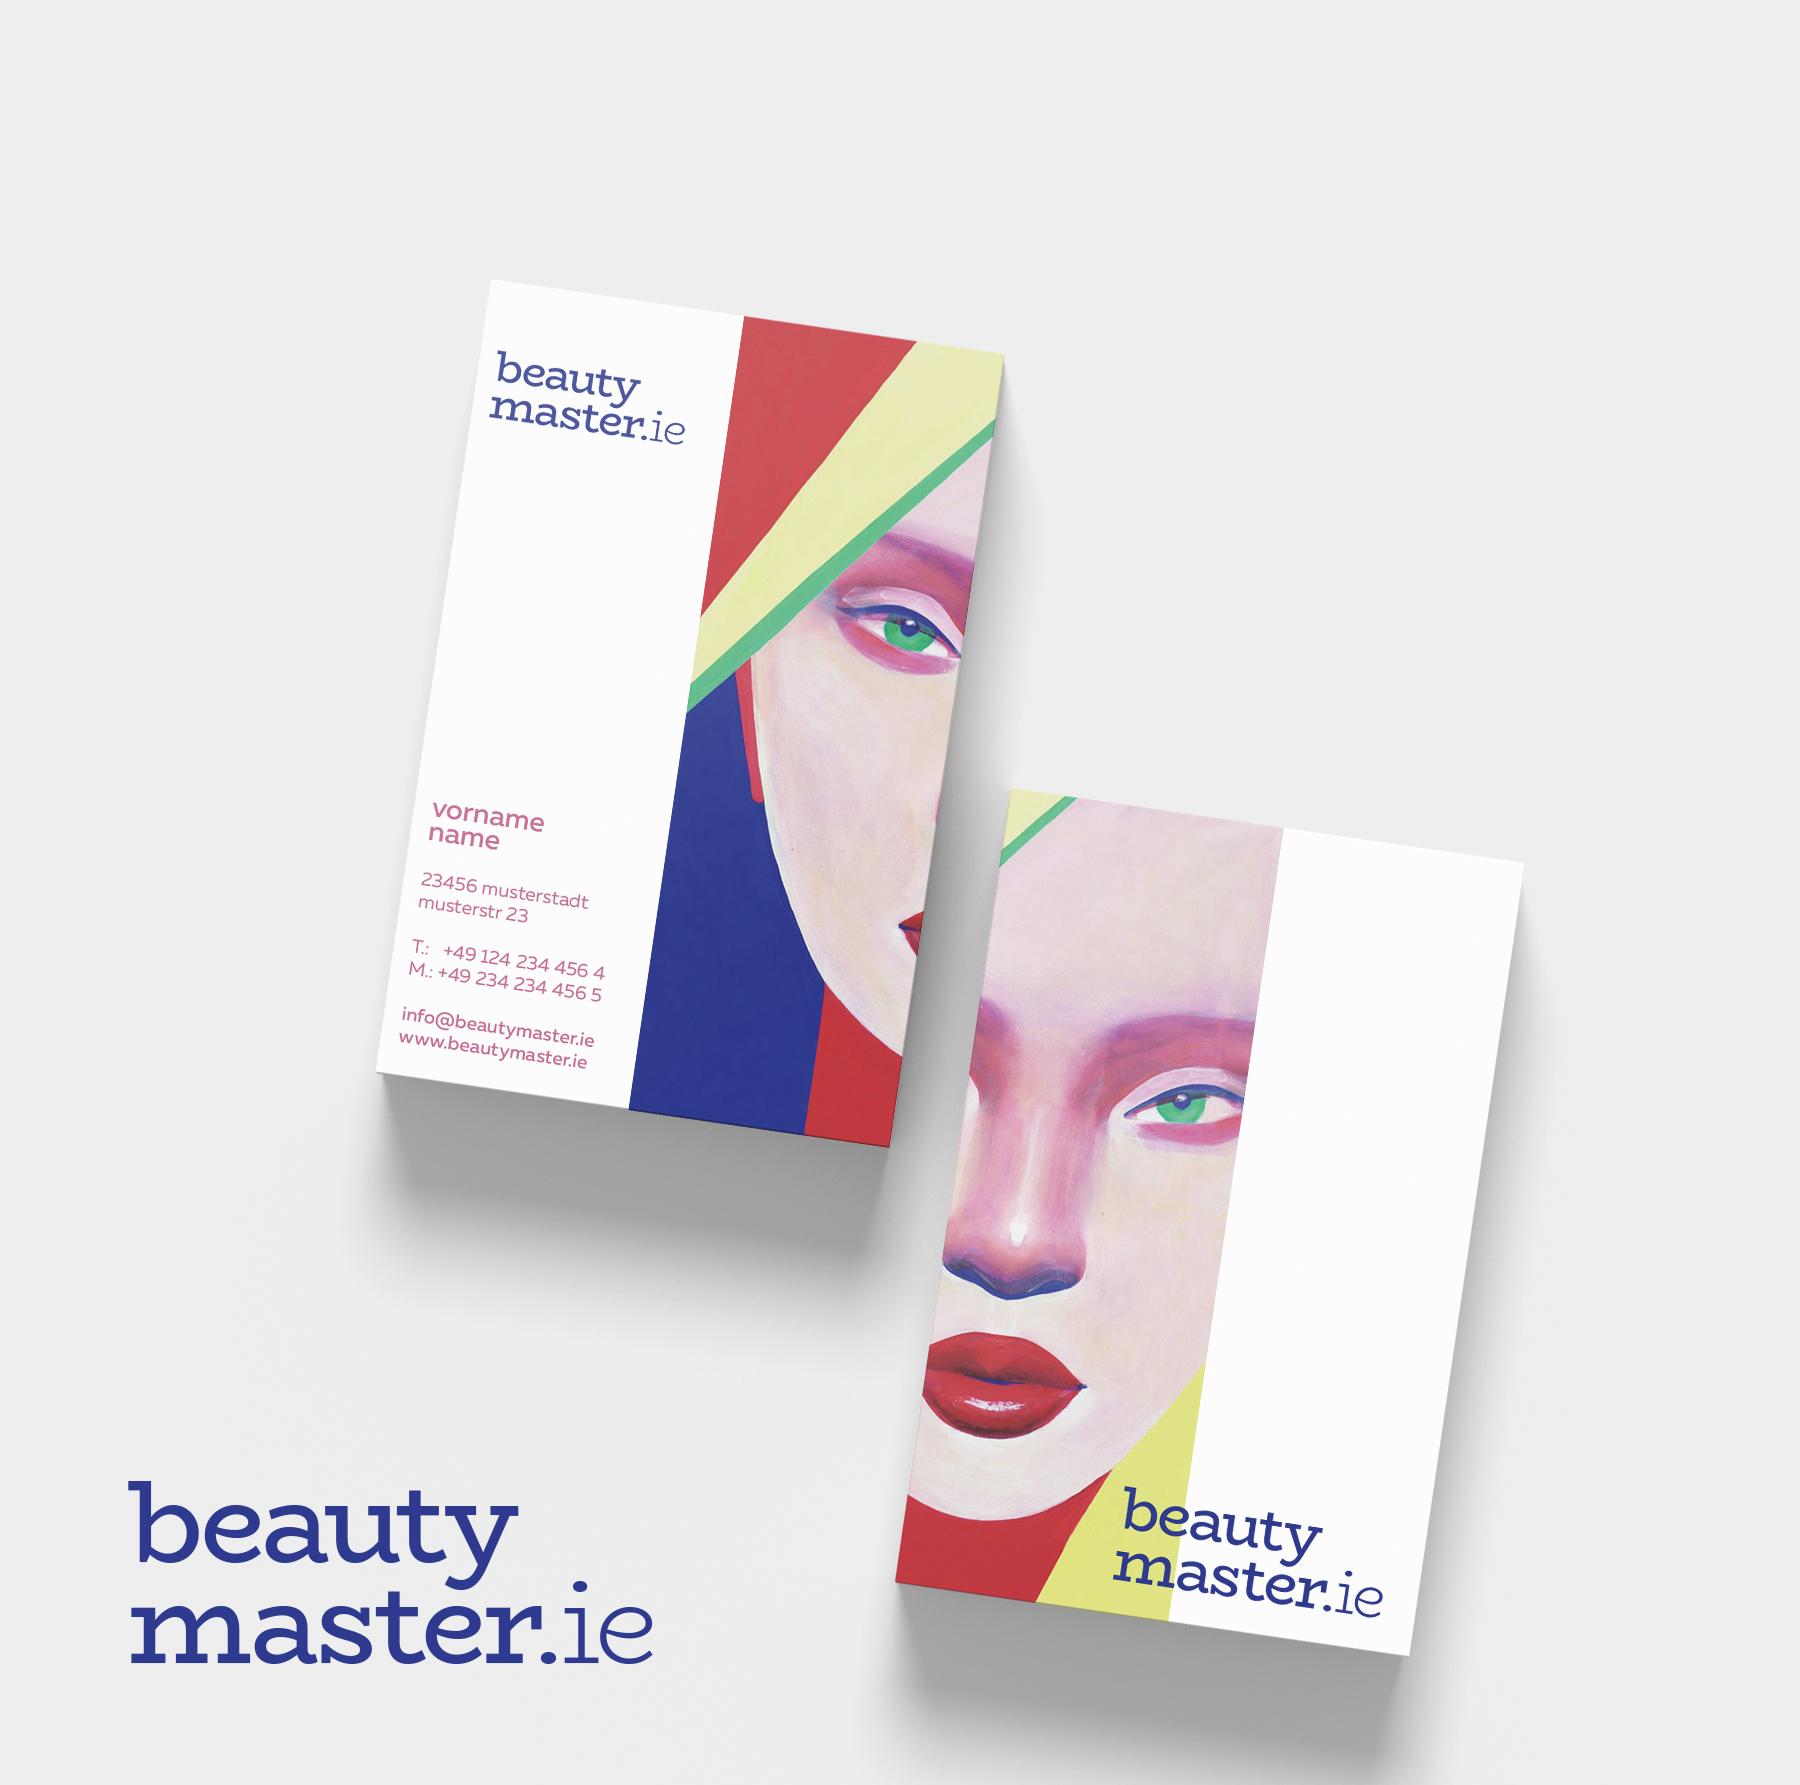 Logo Visitenkarte Für Kosmetik Logo Visitenkarte